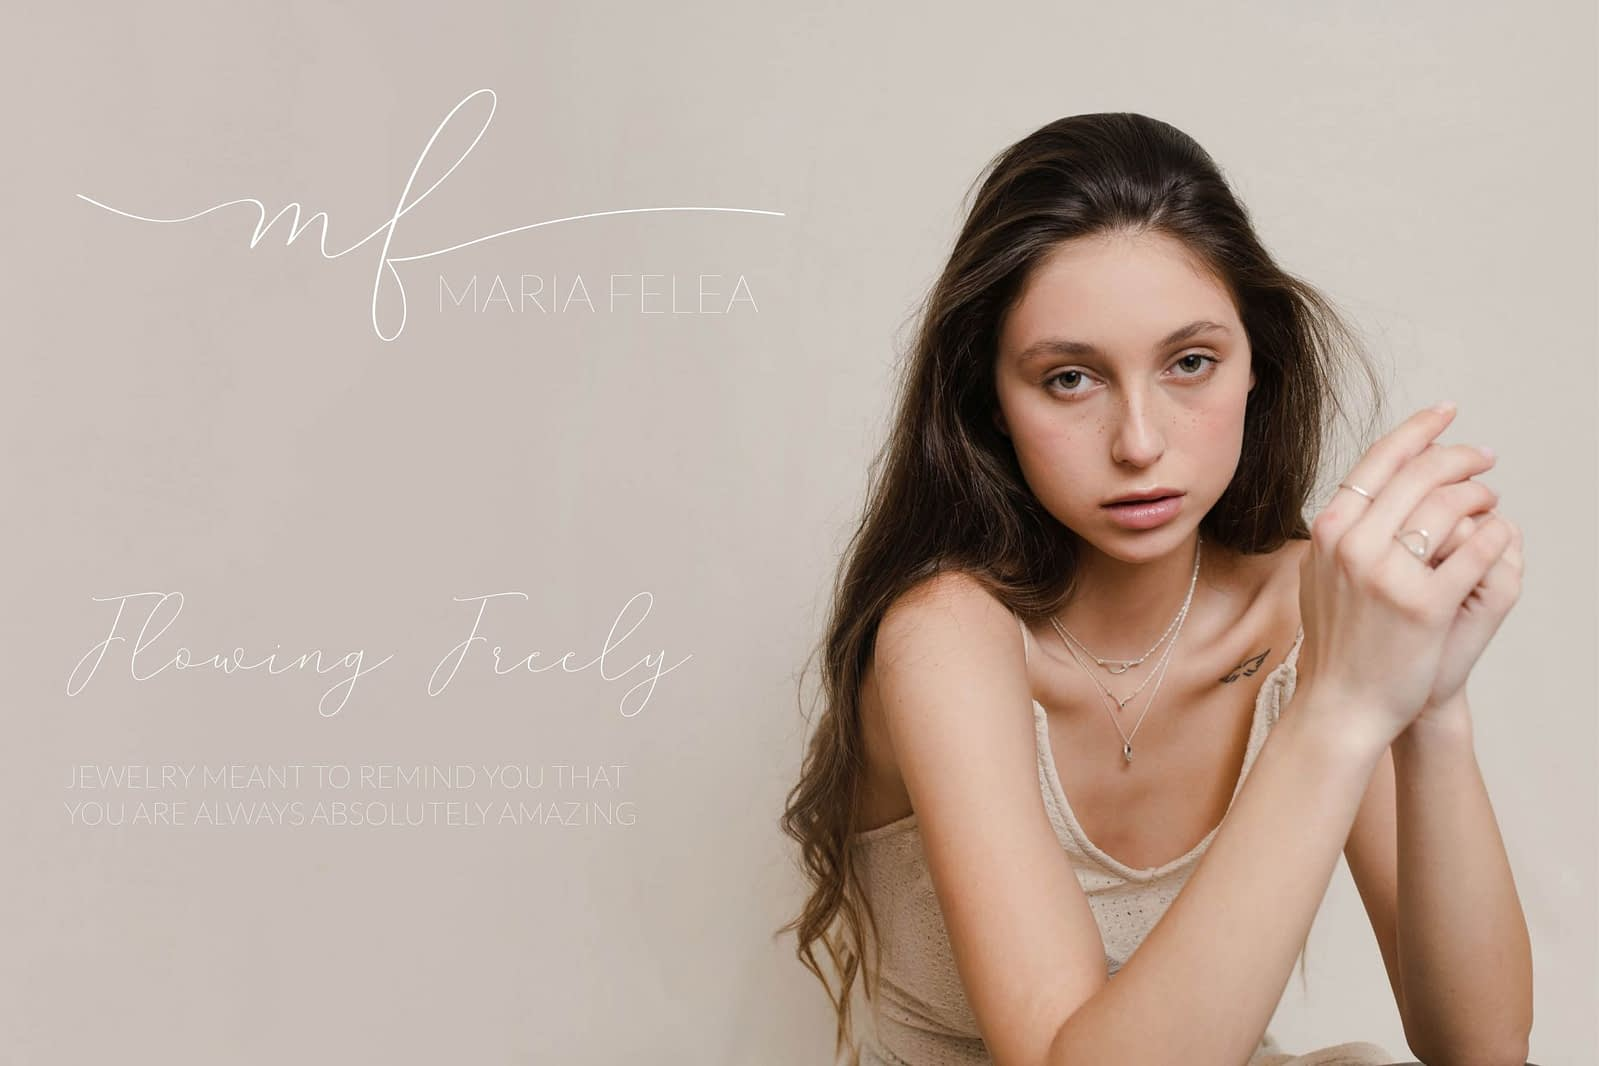 Maria Felea, design, publishing design, identitate vizuala, branding